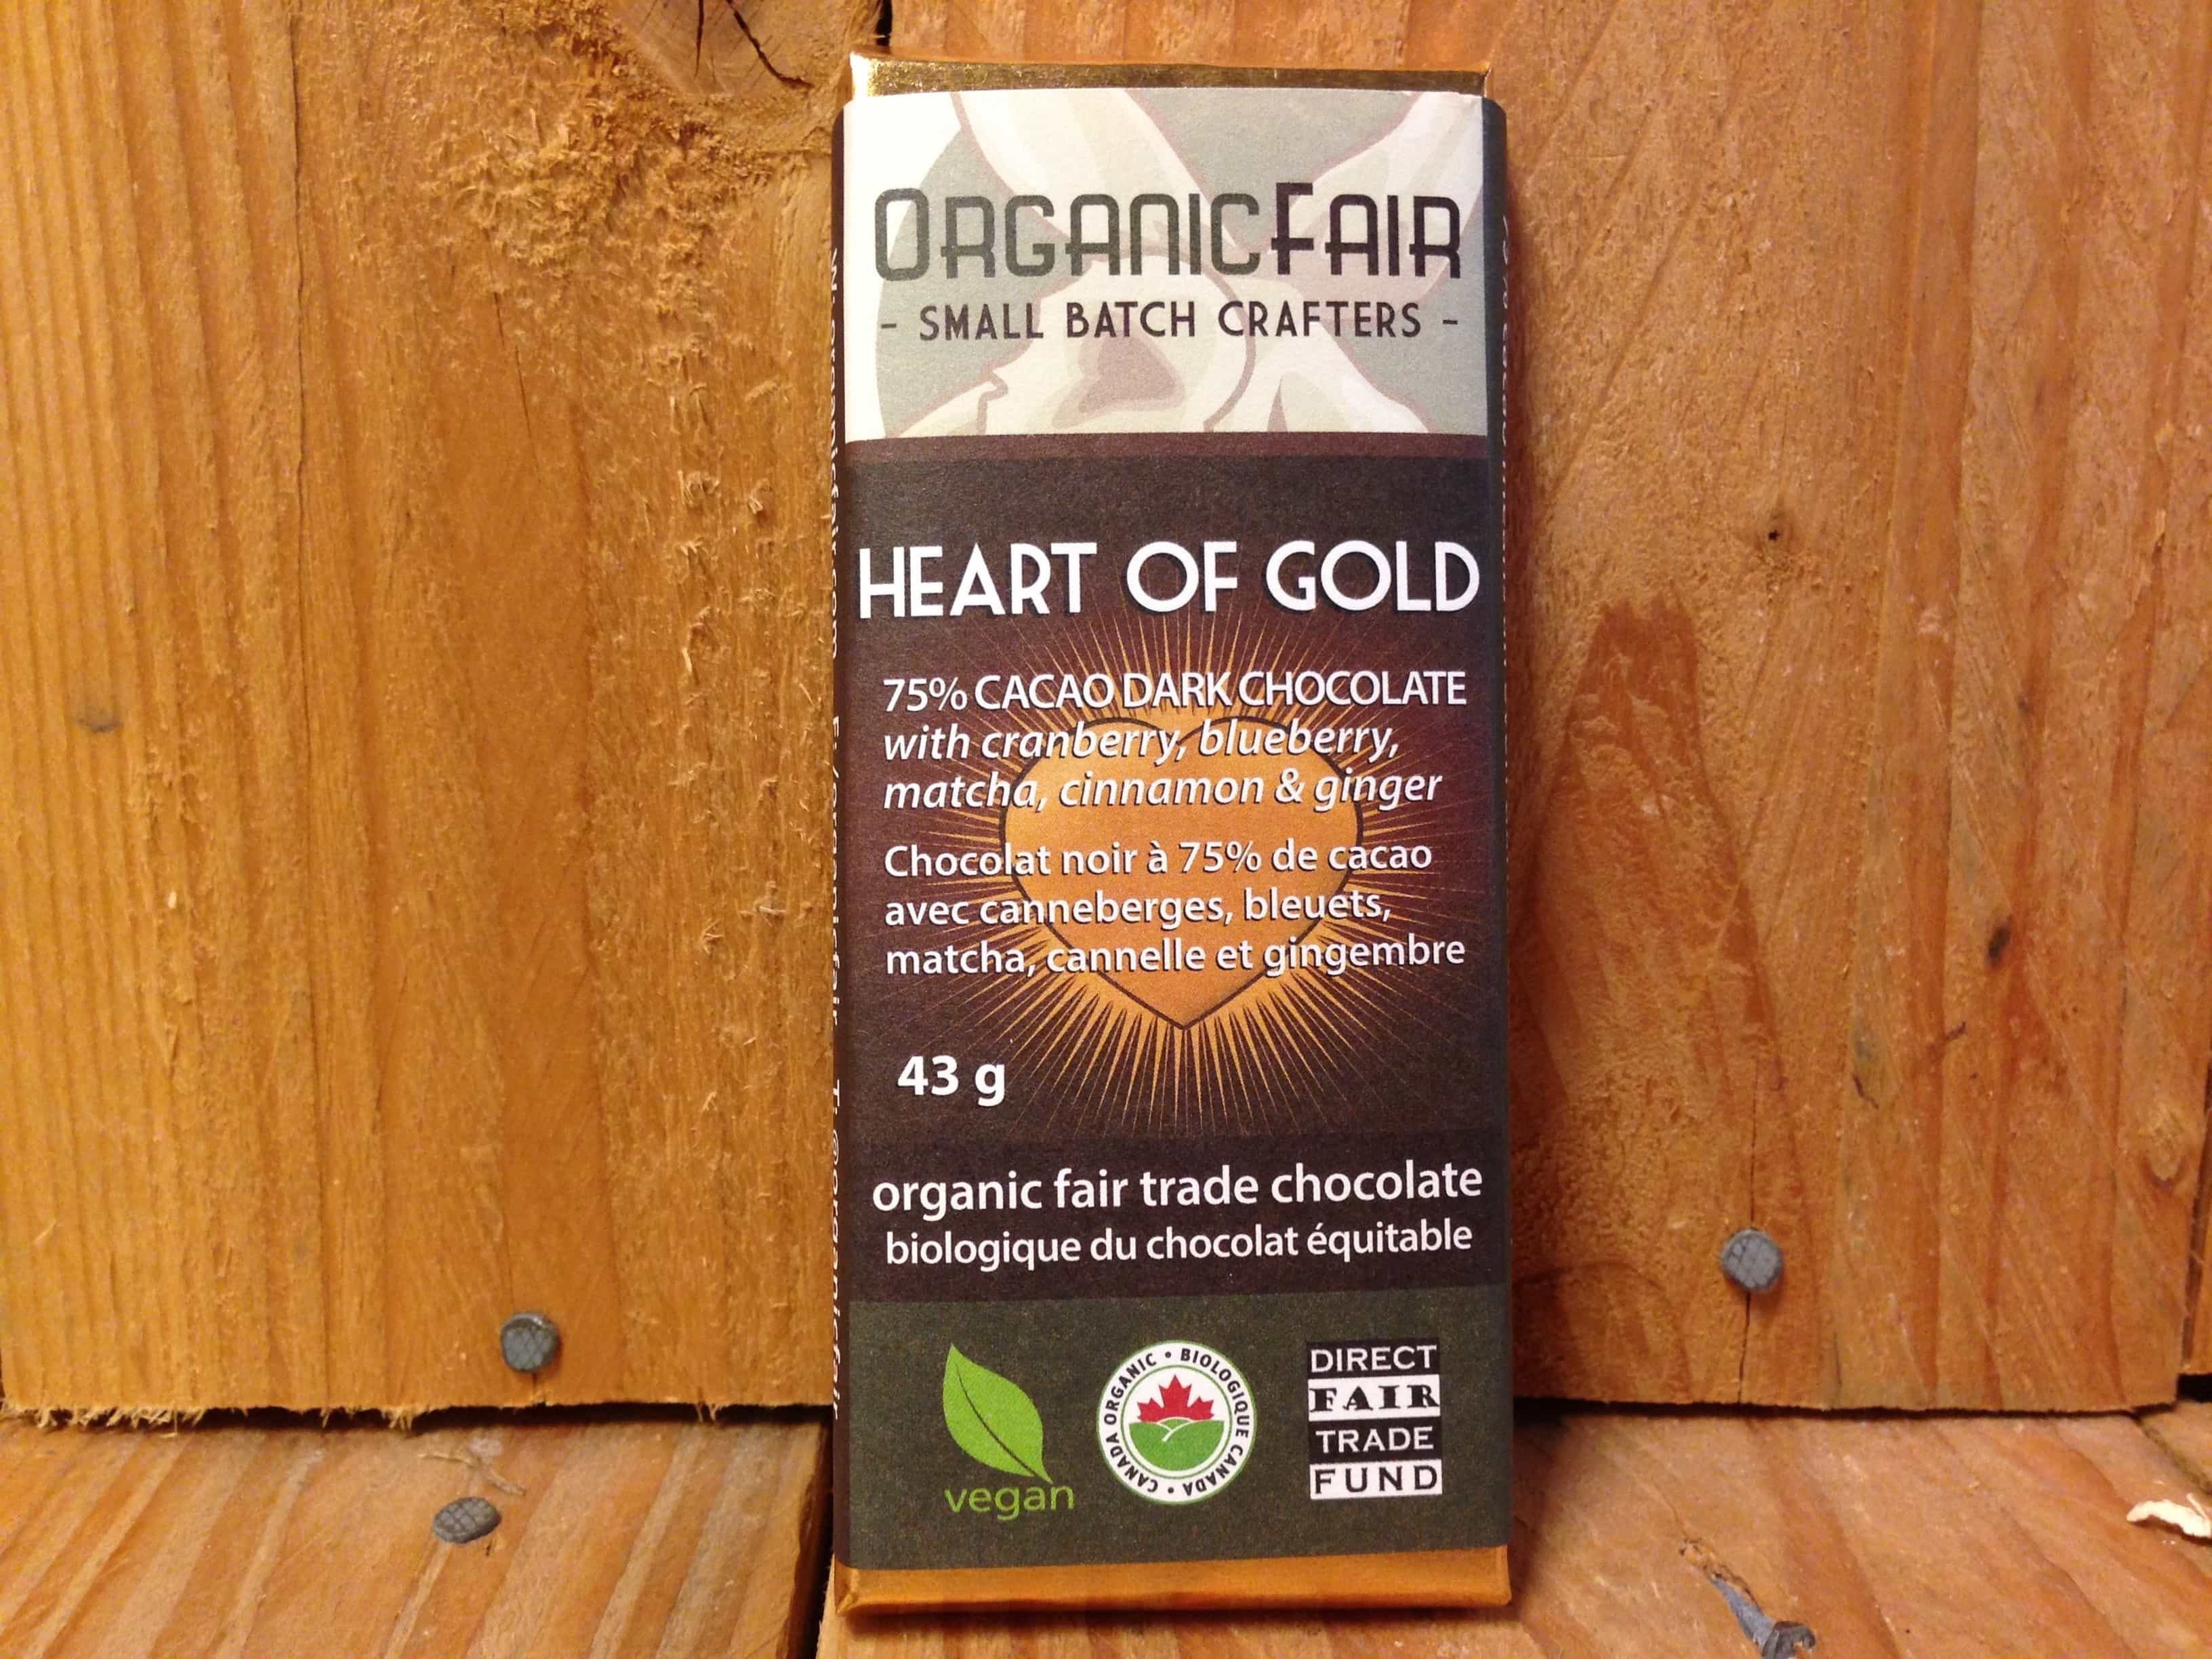 Organic Fair – Chocolate – Heart of Gold (43g)